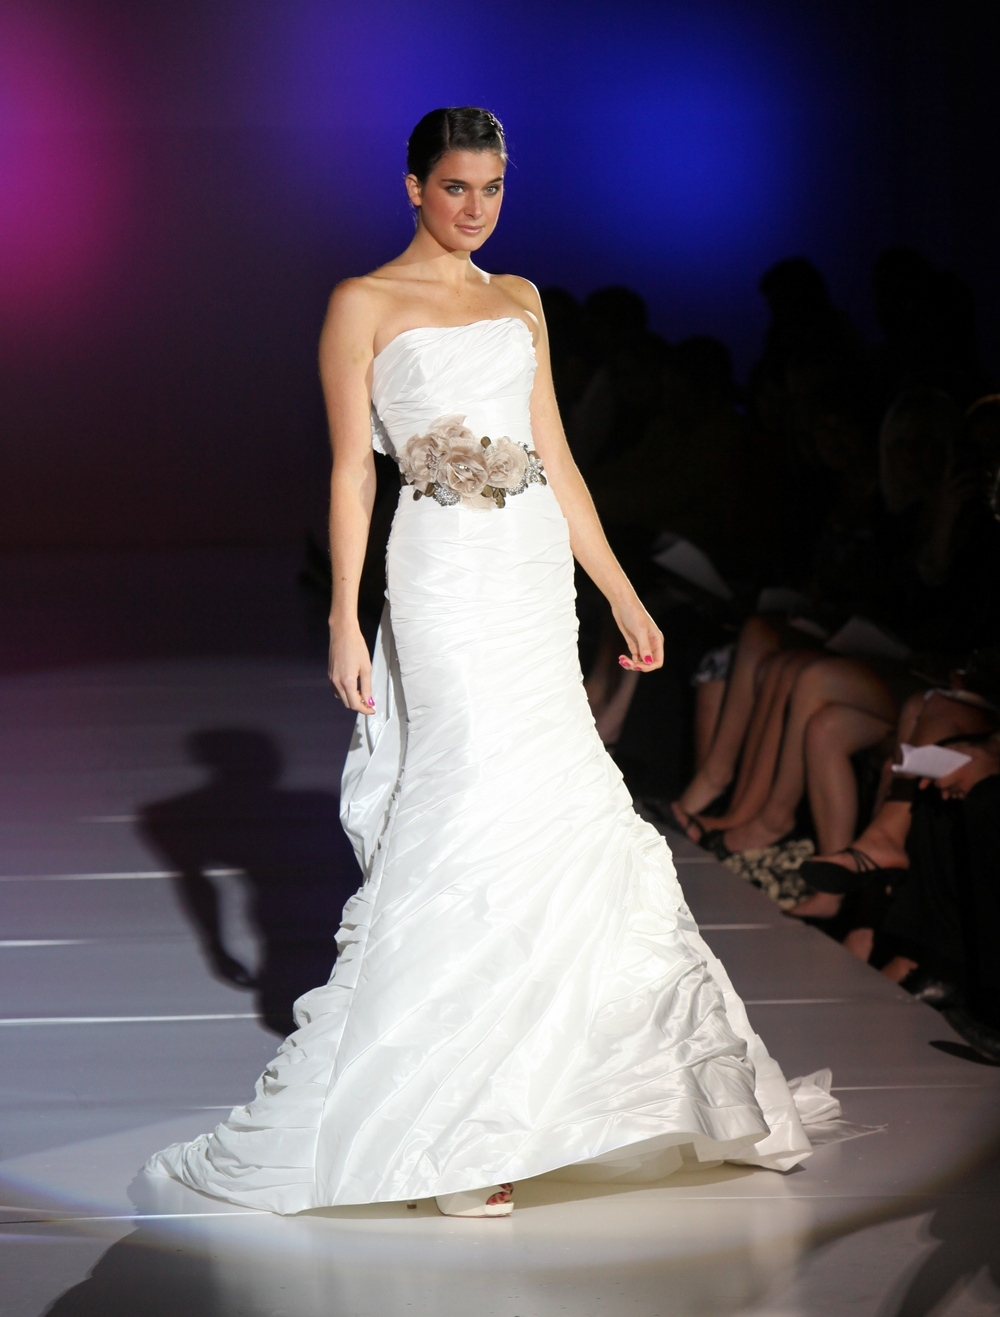 Enzoani-fern-spring-2011-wedding-dress-modified-mermaid-tiers-strapless-statement-bridal-belt.full